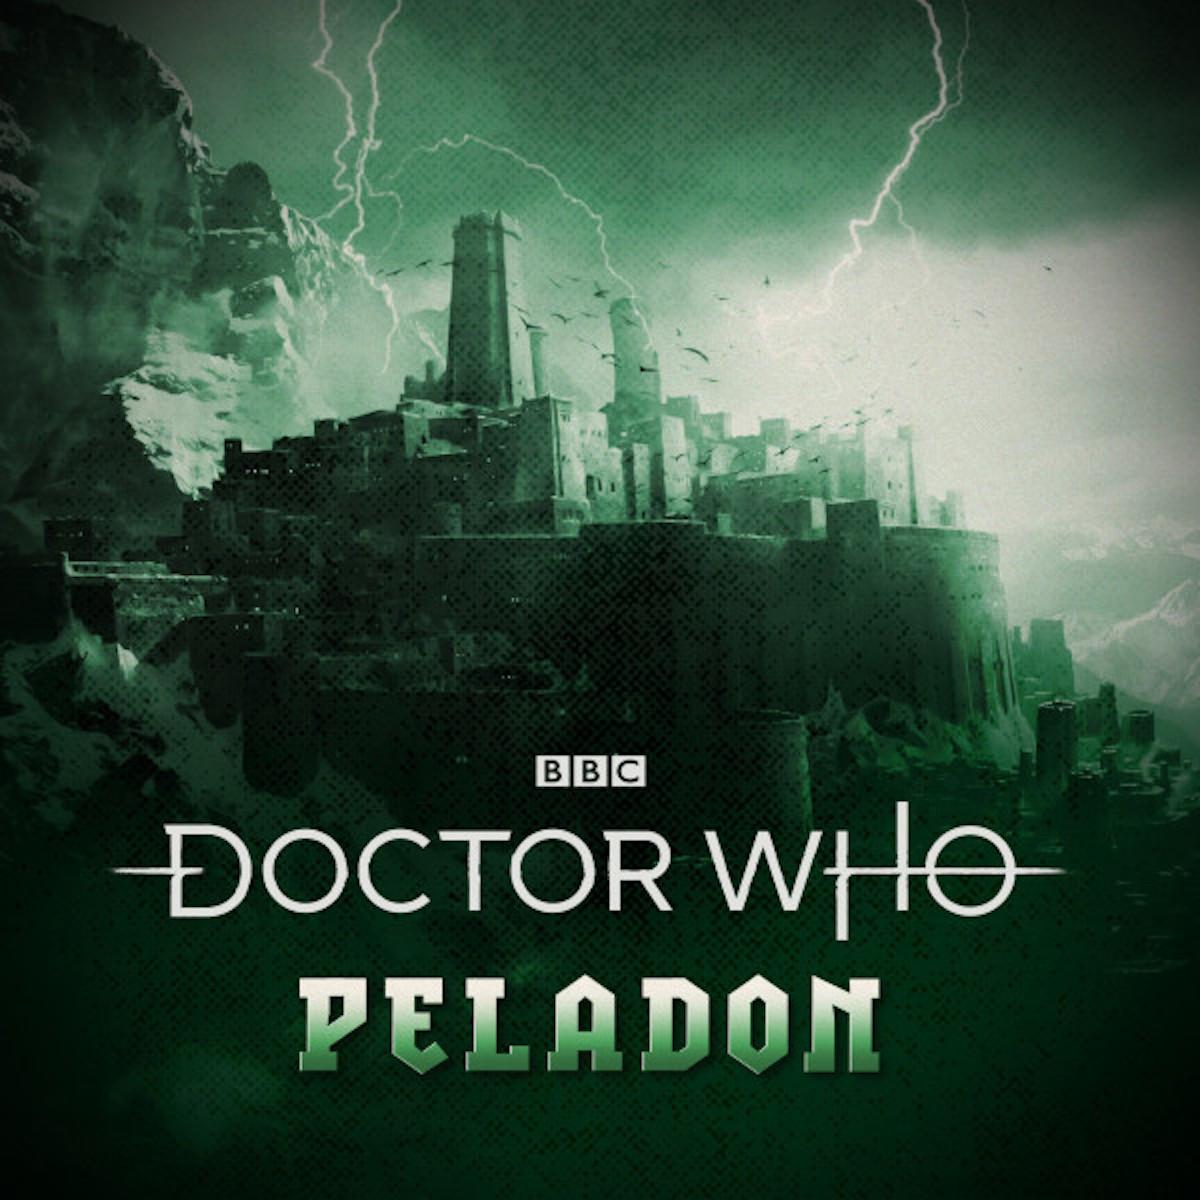 Peladon